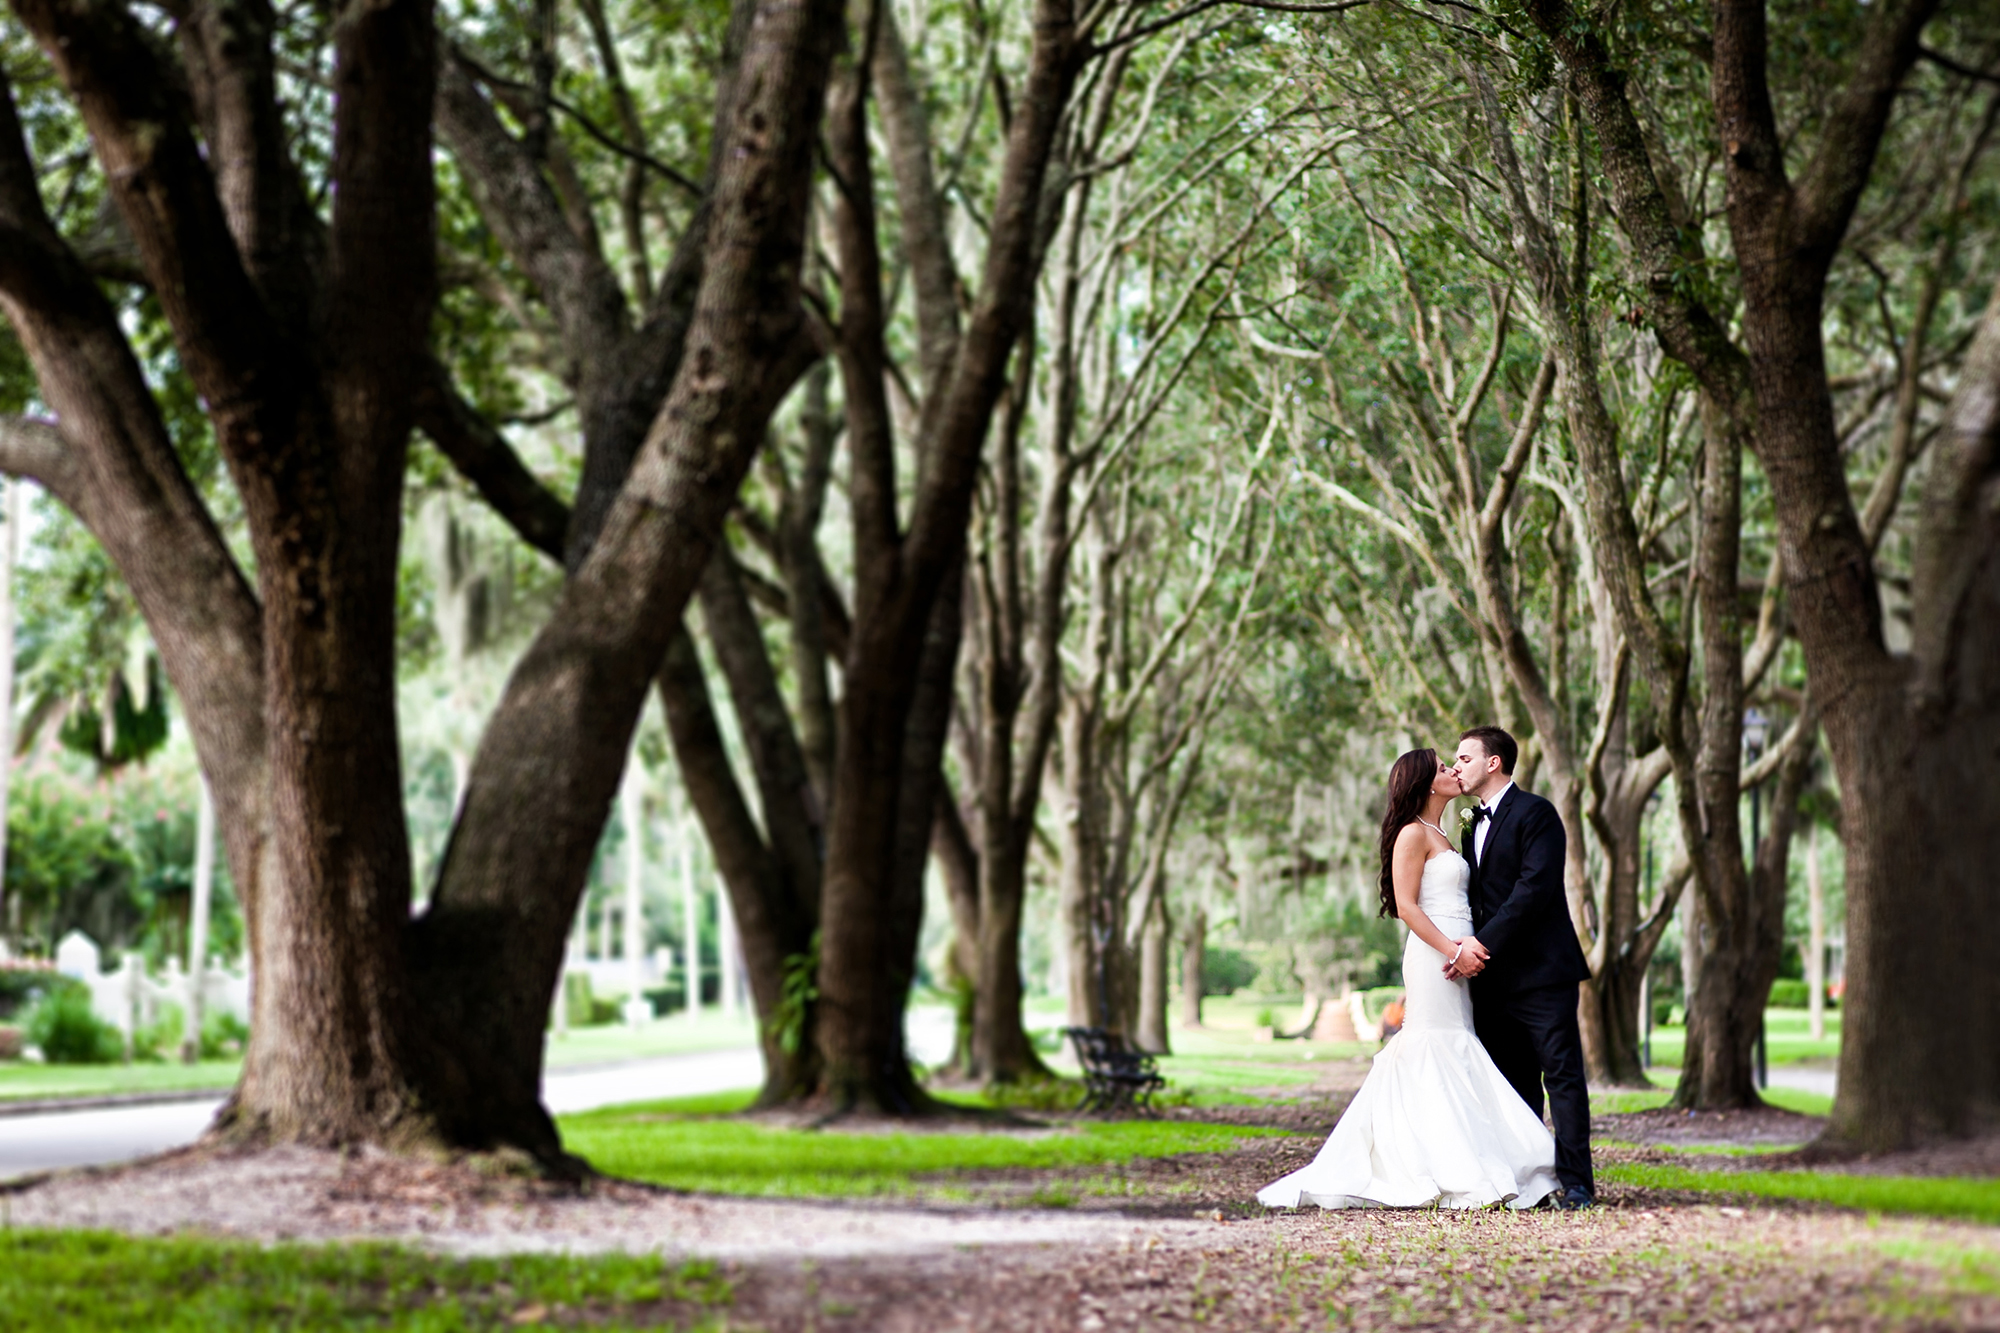 adam-szarmack-bride-groom-kiss-trees.jpg